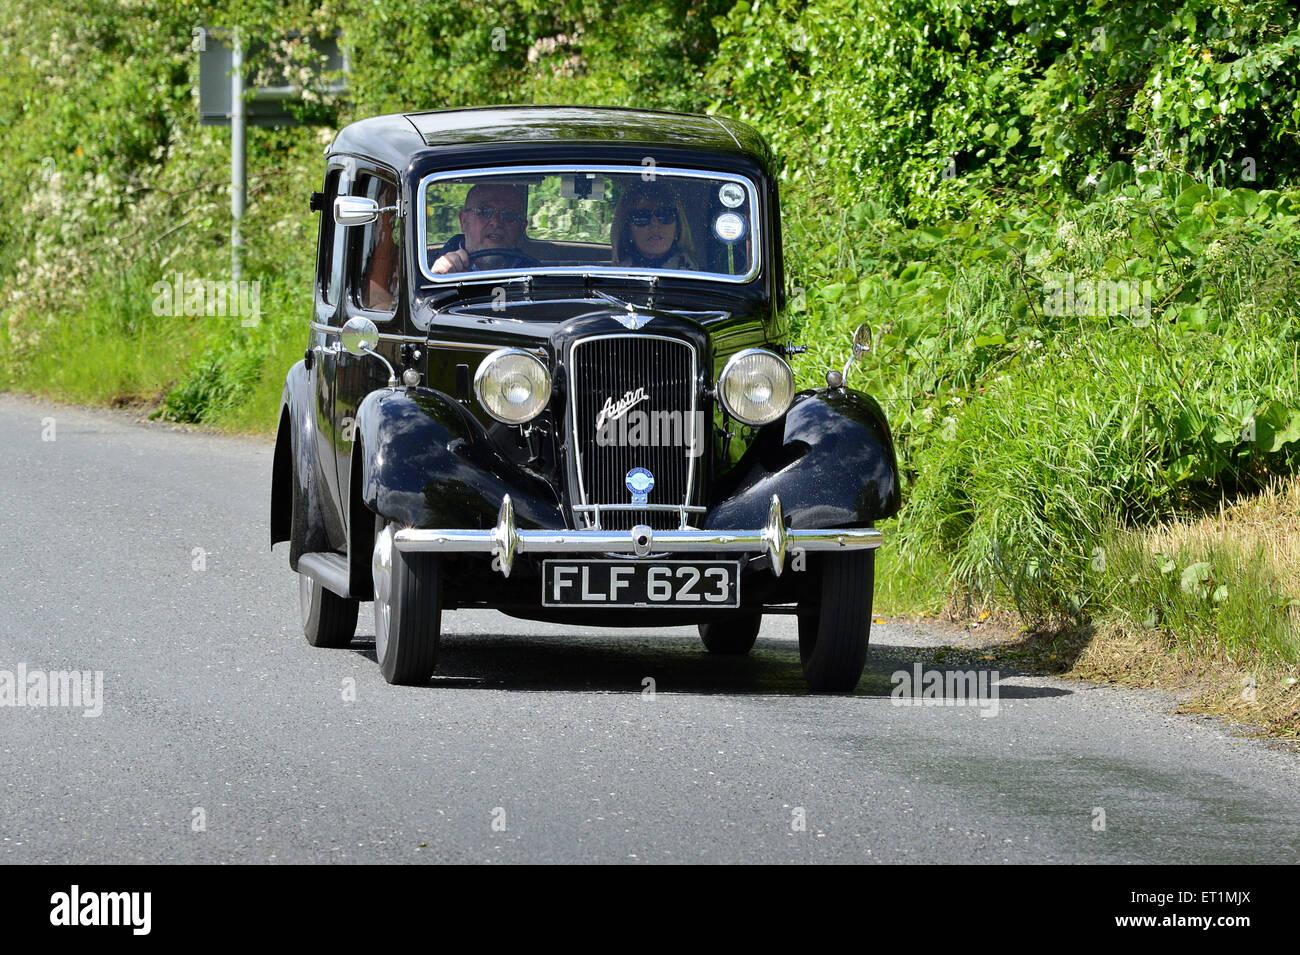 1936 Austin zehn schwarze 4-türige Limousine Oldtimer auf Country Road, Burnfoot, County Donegal, Irland Stockbild